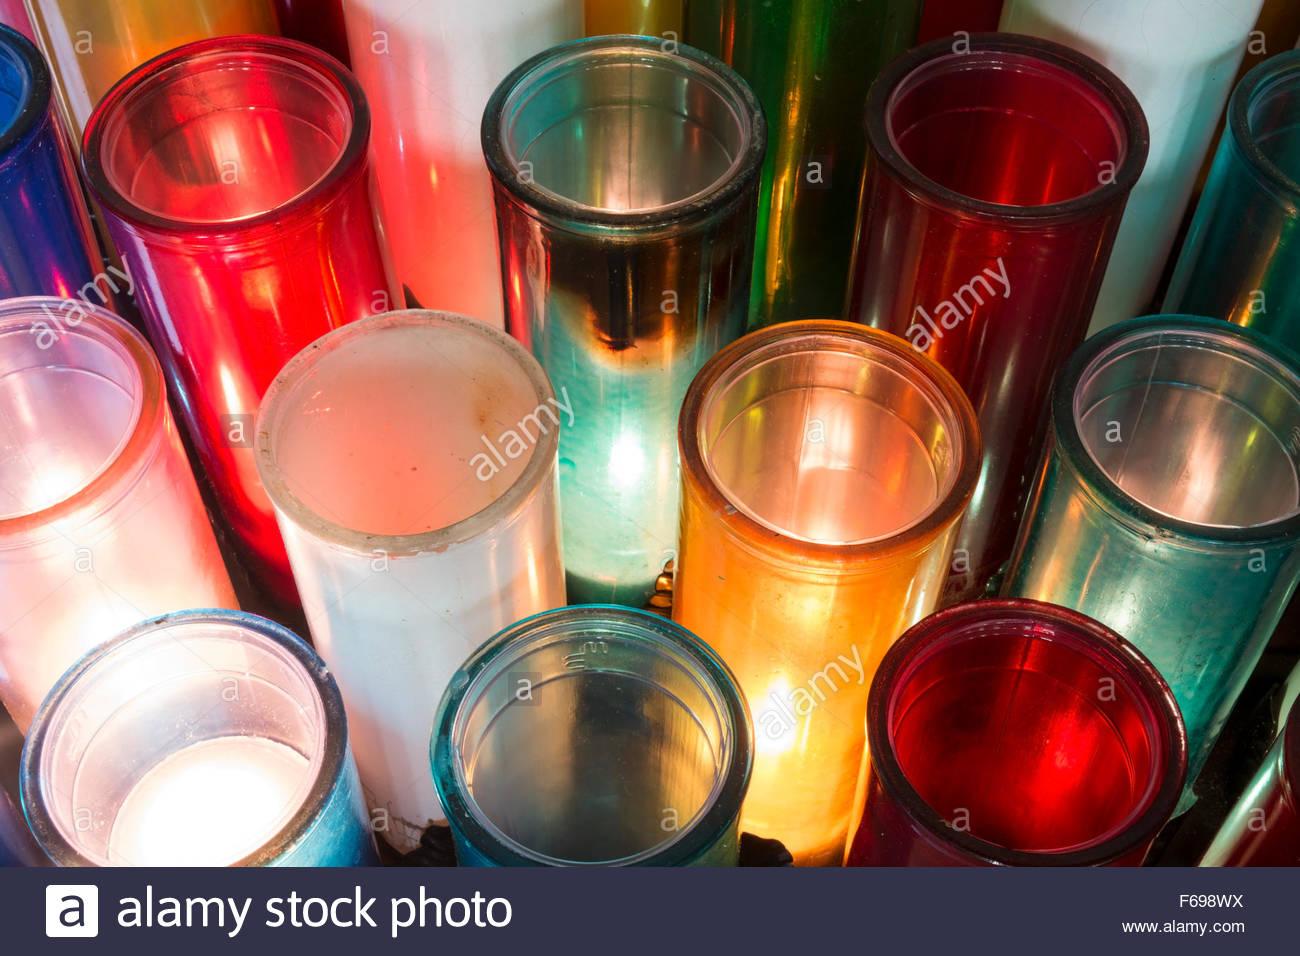 La devozione candele ad Baie-Saint-Paolo Chiesa, Baie-Saint-Paul, Quebec, Canada Immagini Stock